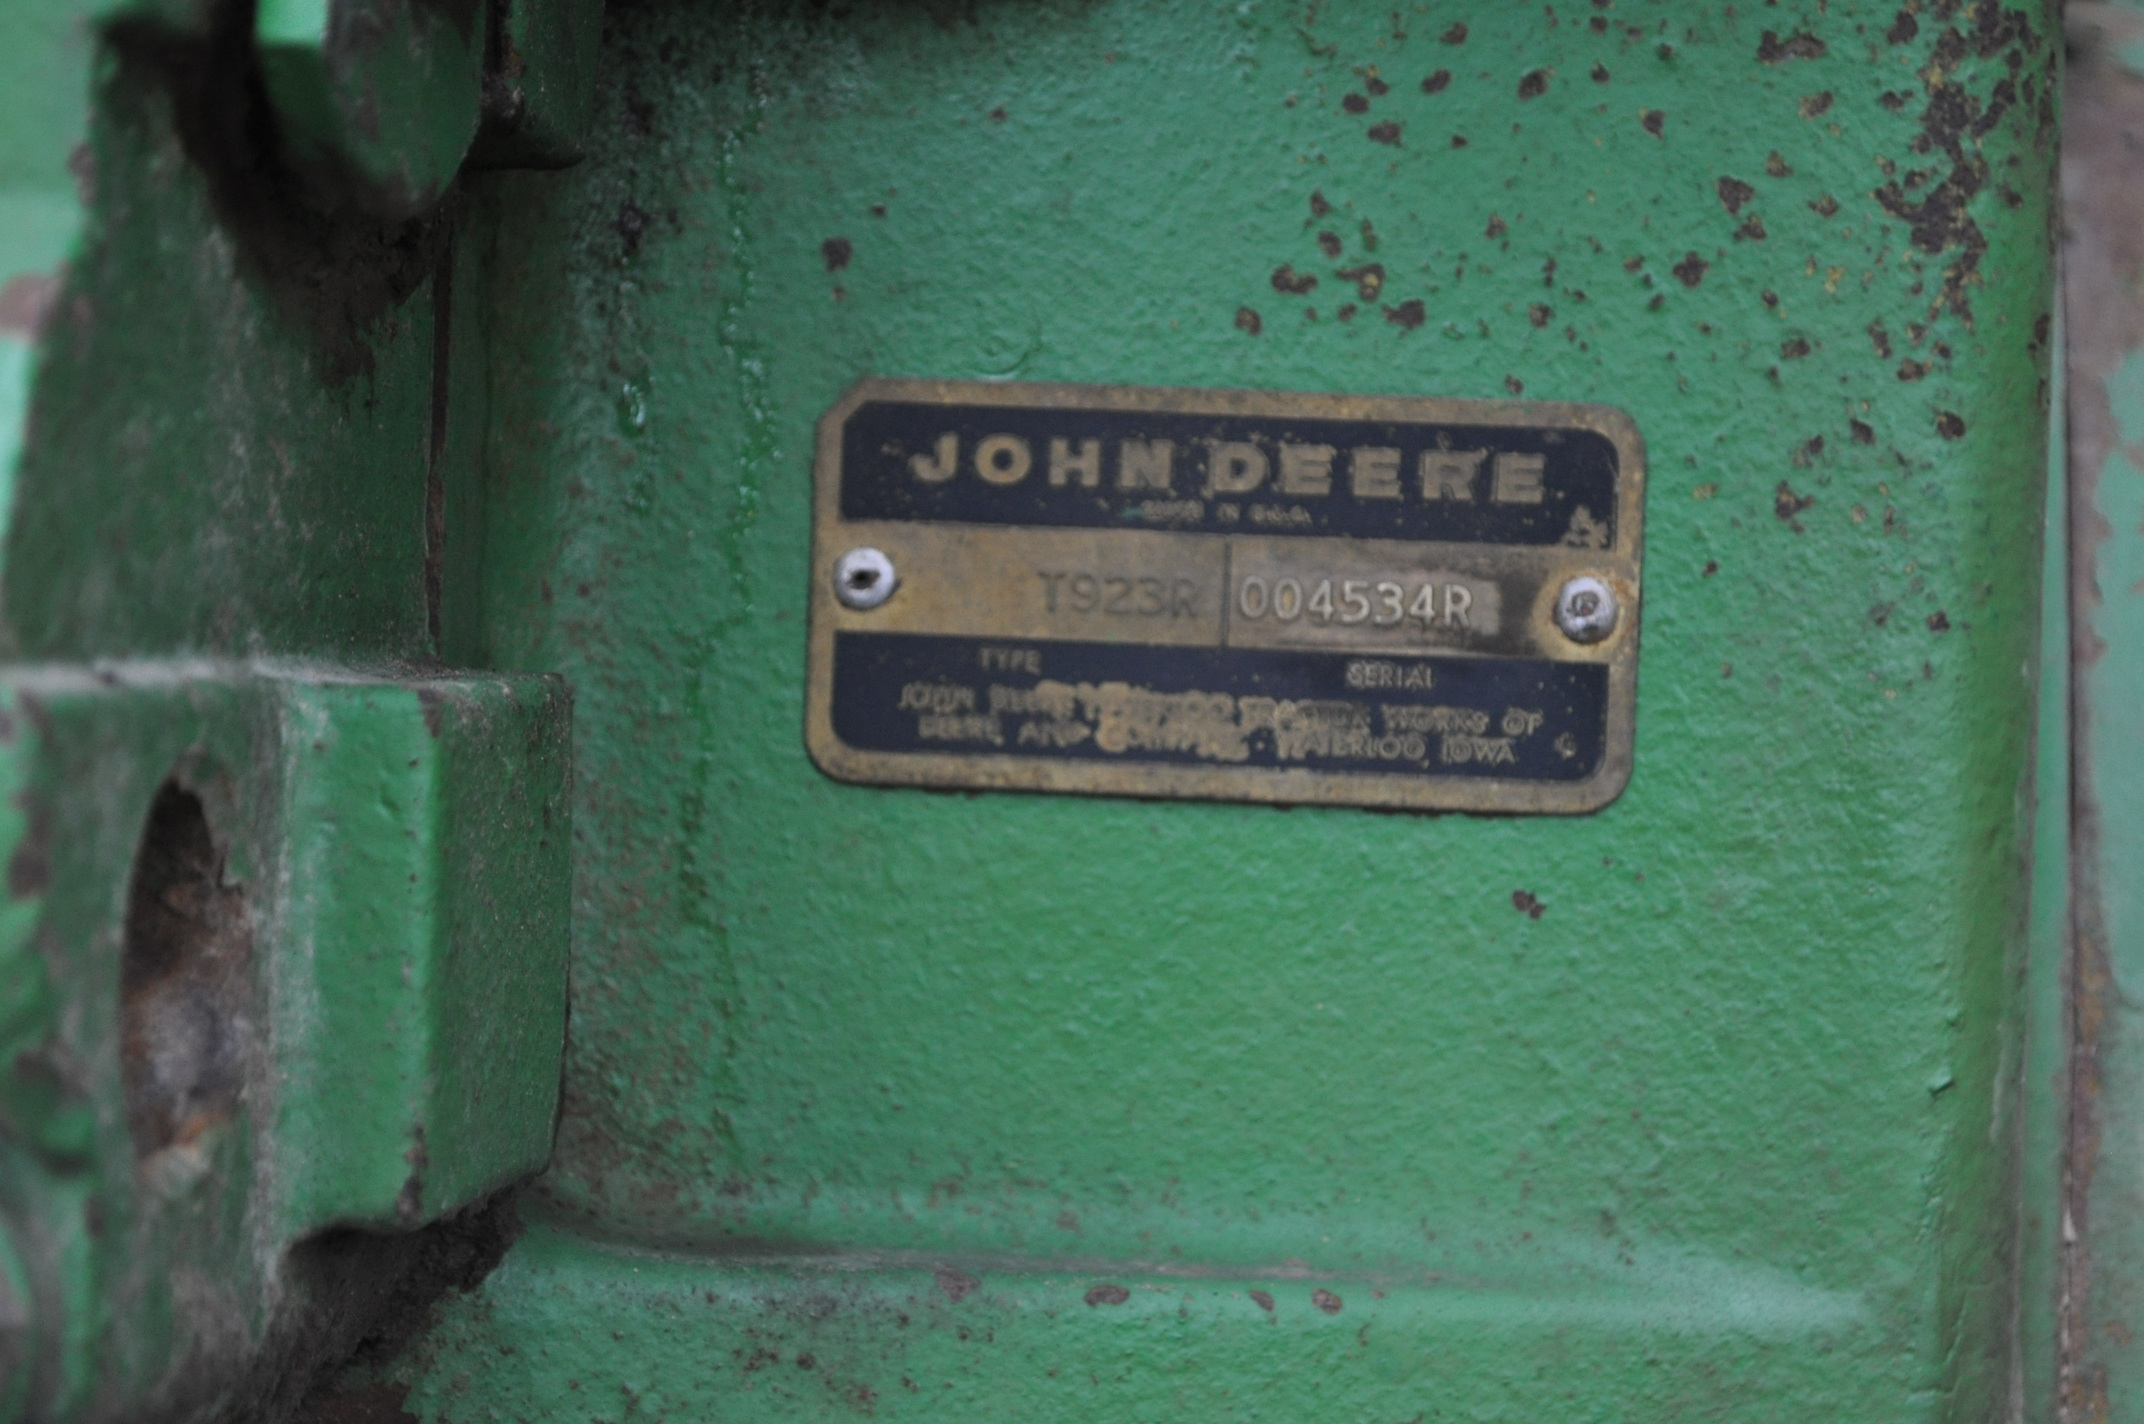 John Deere 7520 tractor, 4WD, diesel, 18.4-34 duals, original fenders, CHA, cab interior kit, 3 - Image 13 of 24